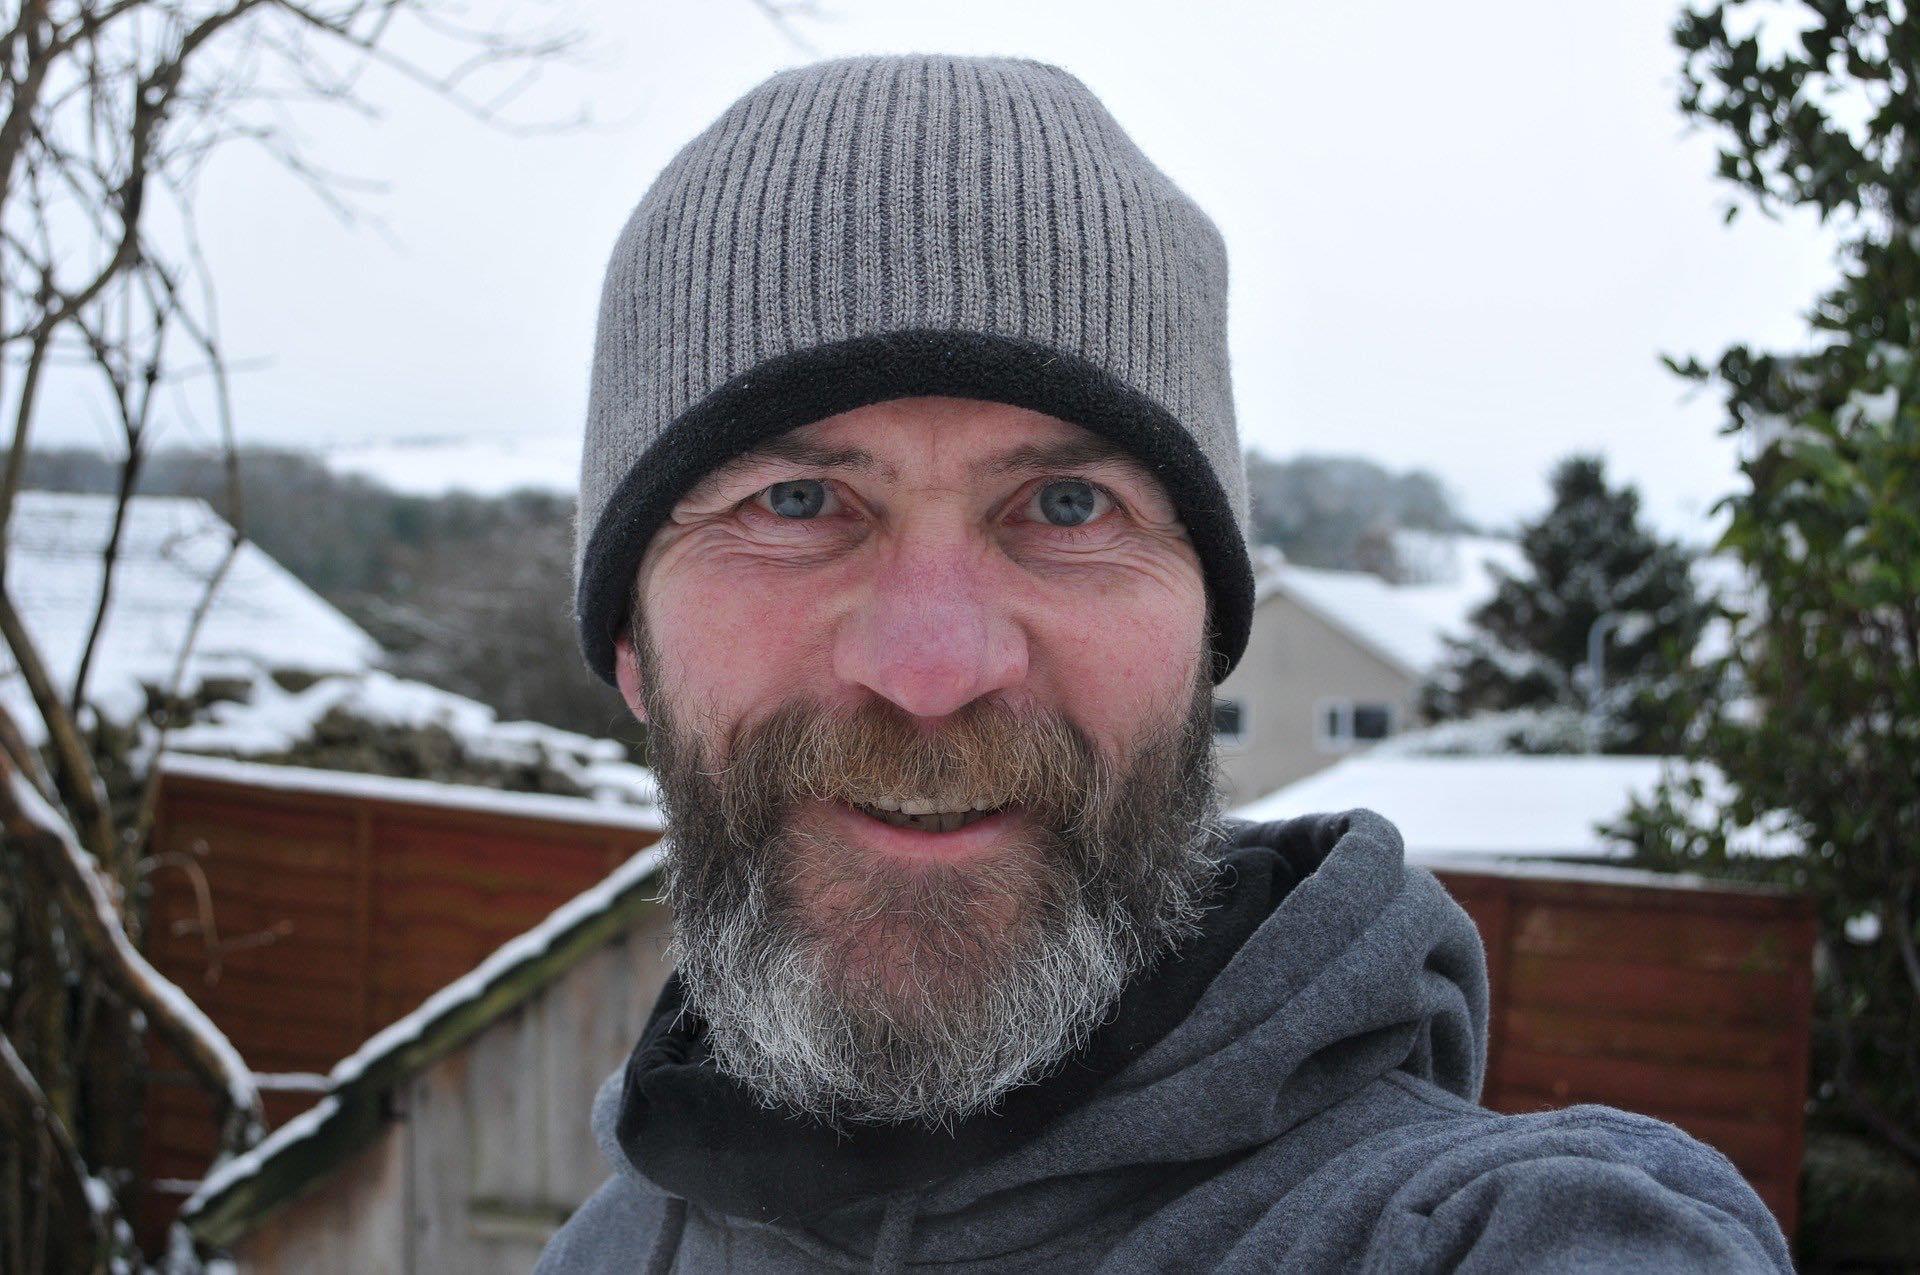 popular beard styles include the lumberjack look